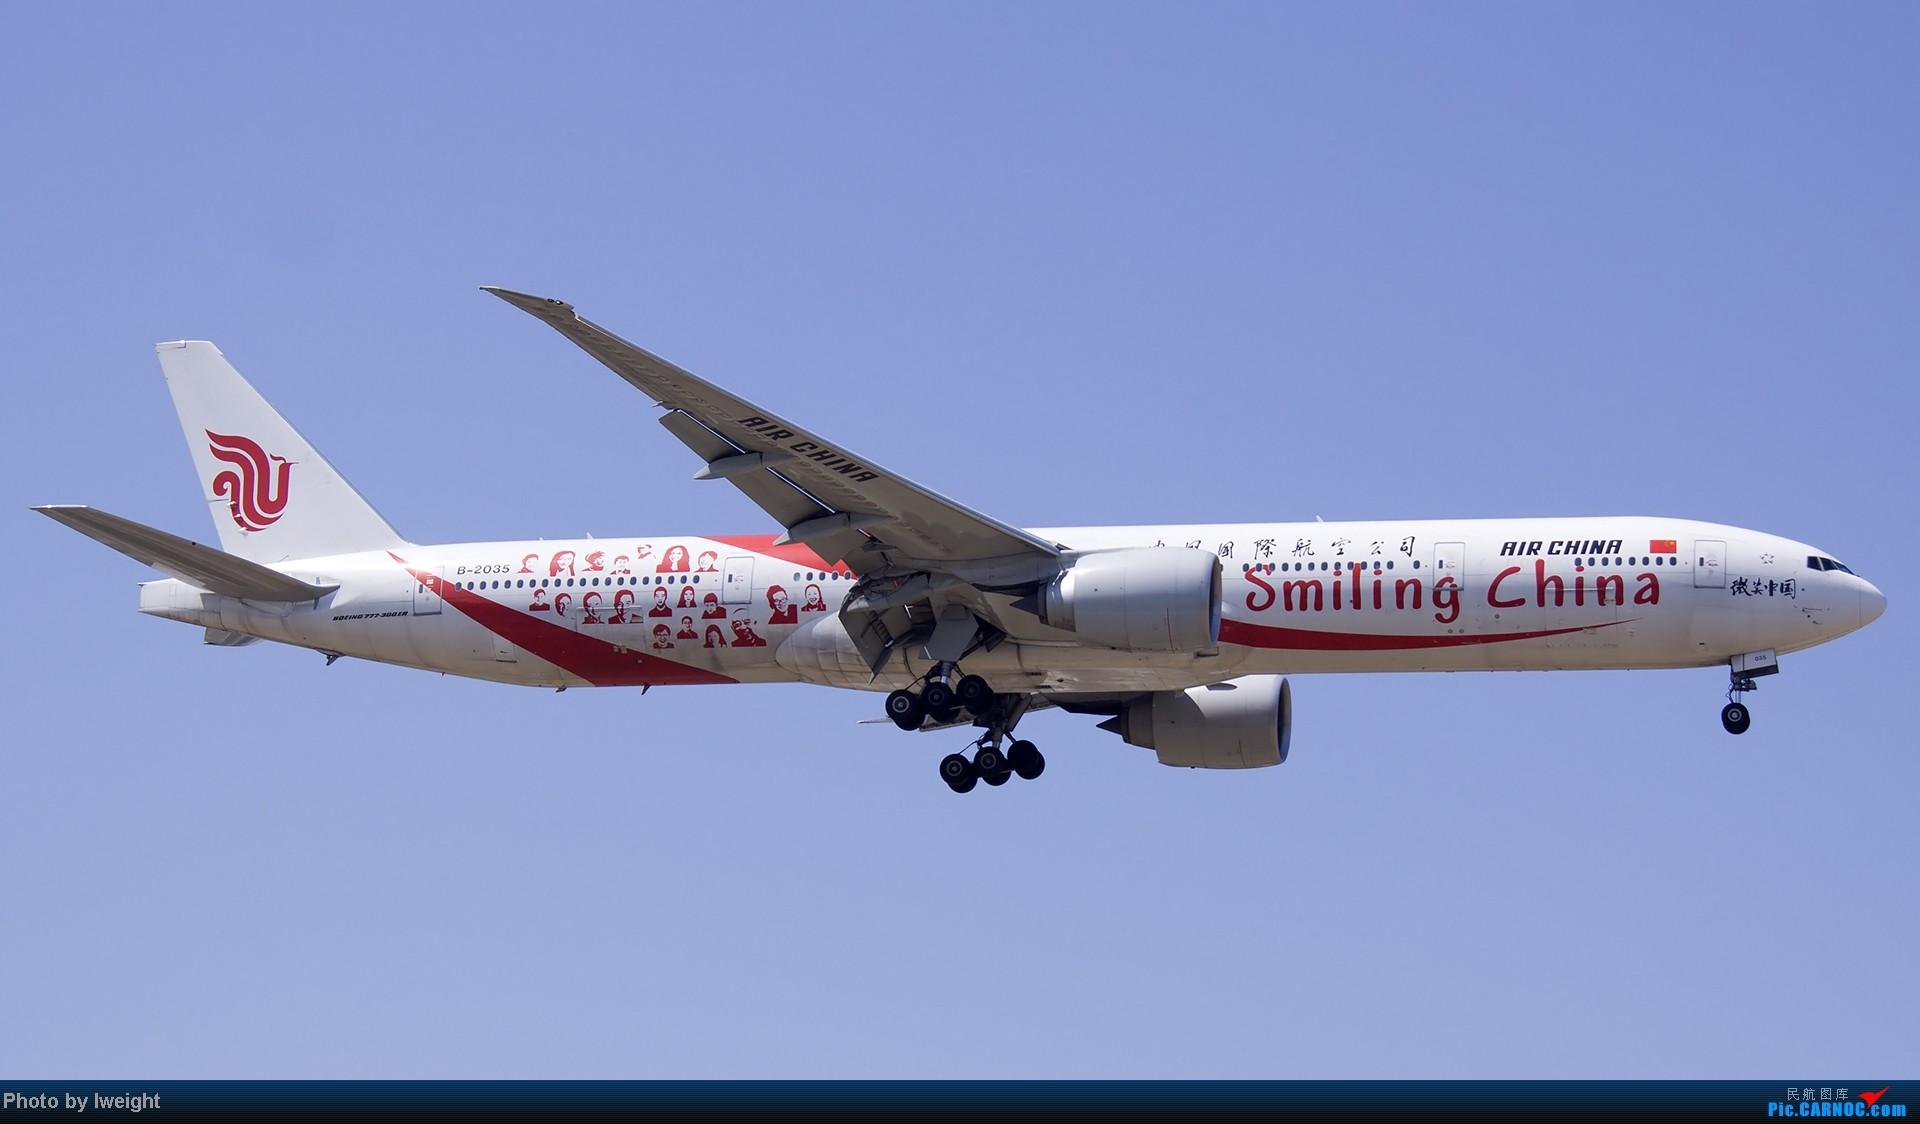 Re:[原创]北京难得的好天气,收获多种机型和彩绘,遗憾的是再次错过卡航巴塞罗那彩绘 BOEING 777-300 B-2035 中国北京首都机场